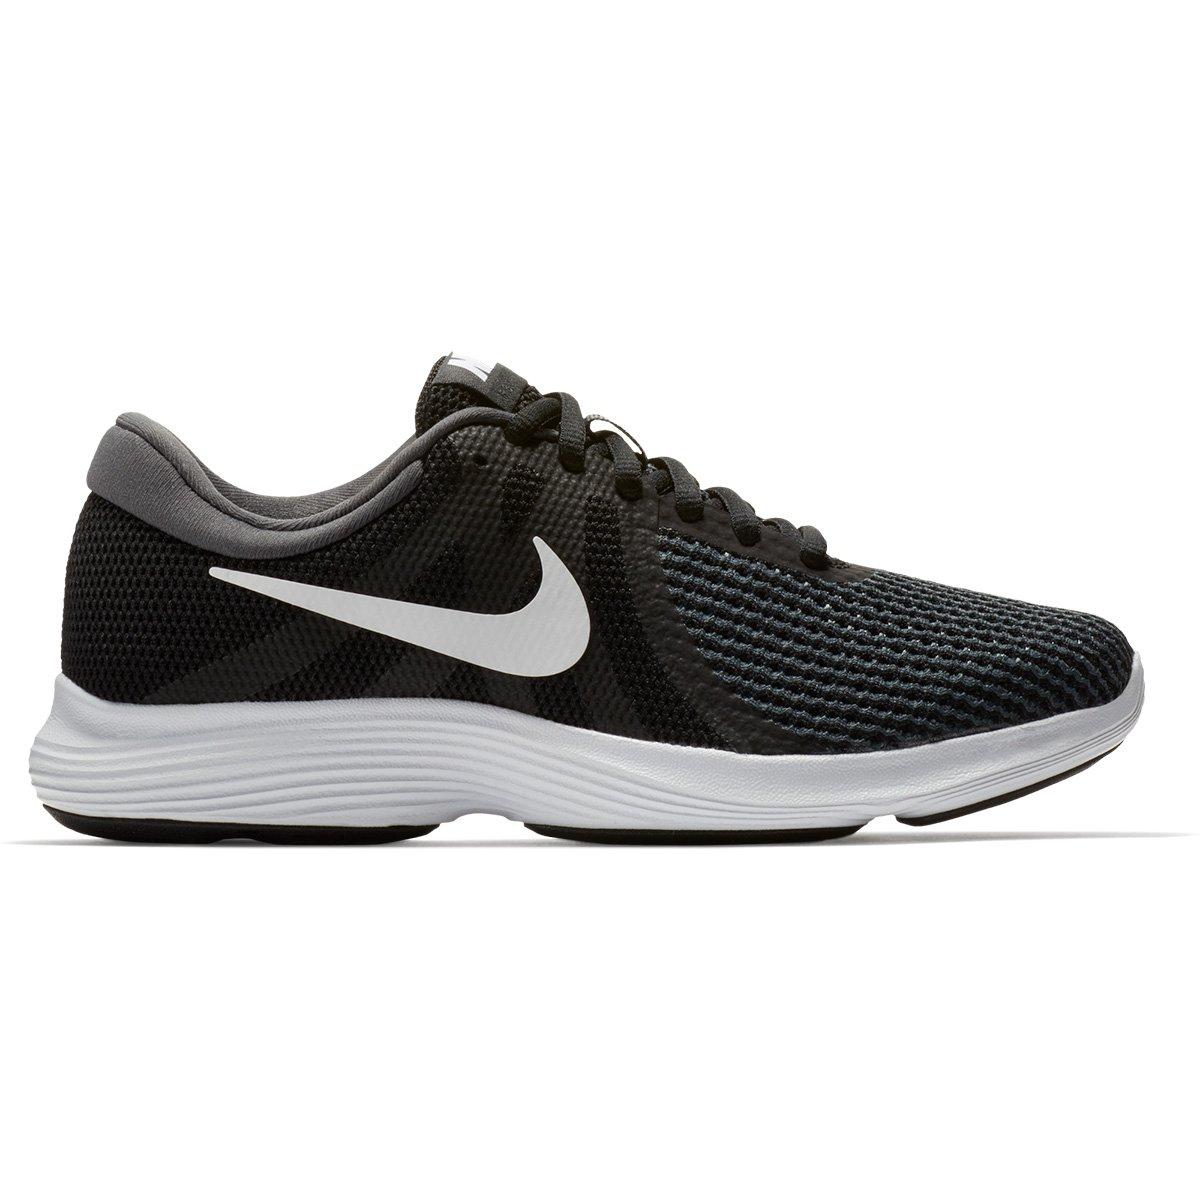 Tênis Nike Wmns Revolution 4 Feminino - Preto e Branco - Compre ... eb0b4857aef9c